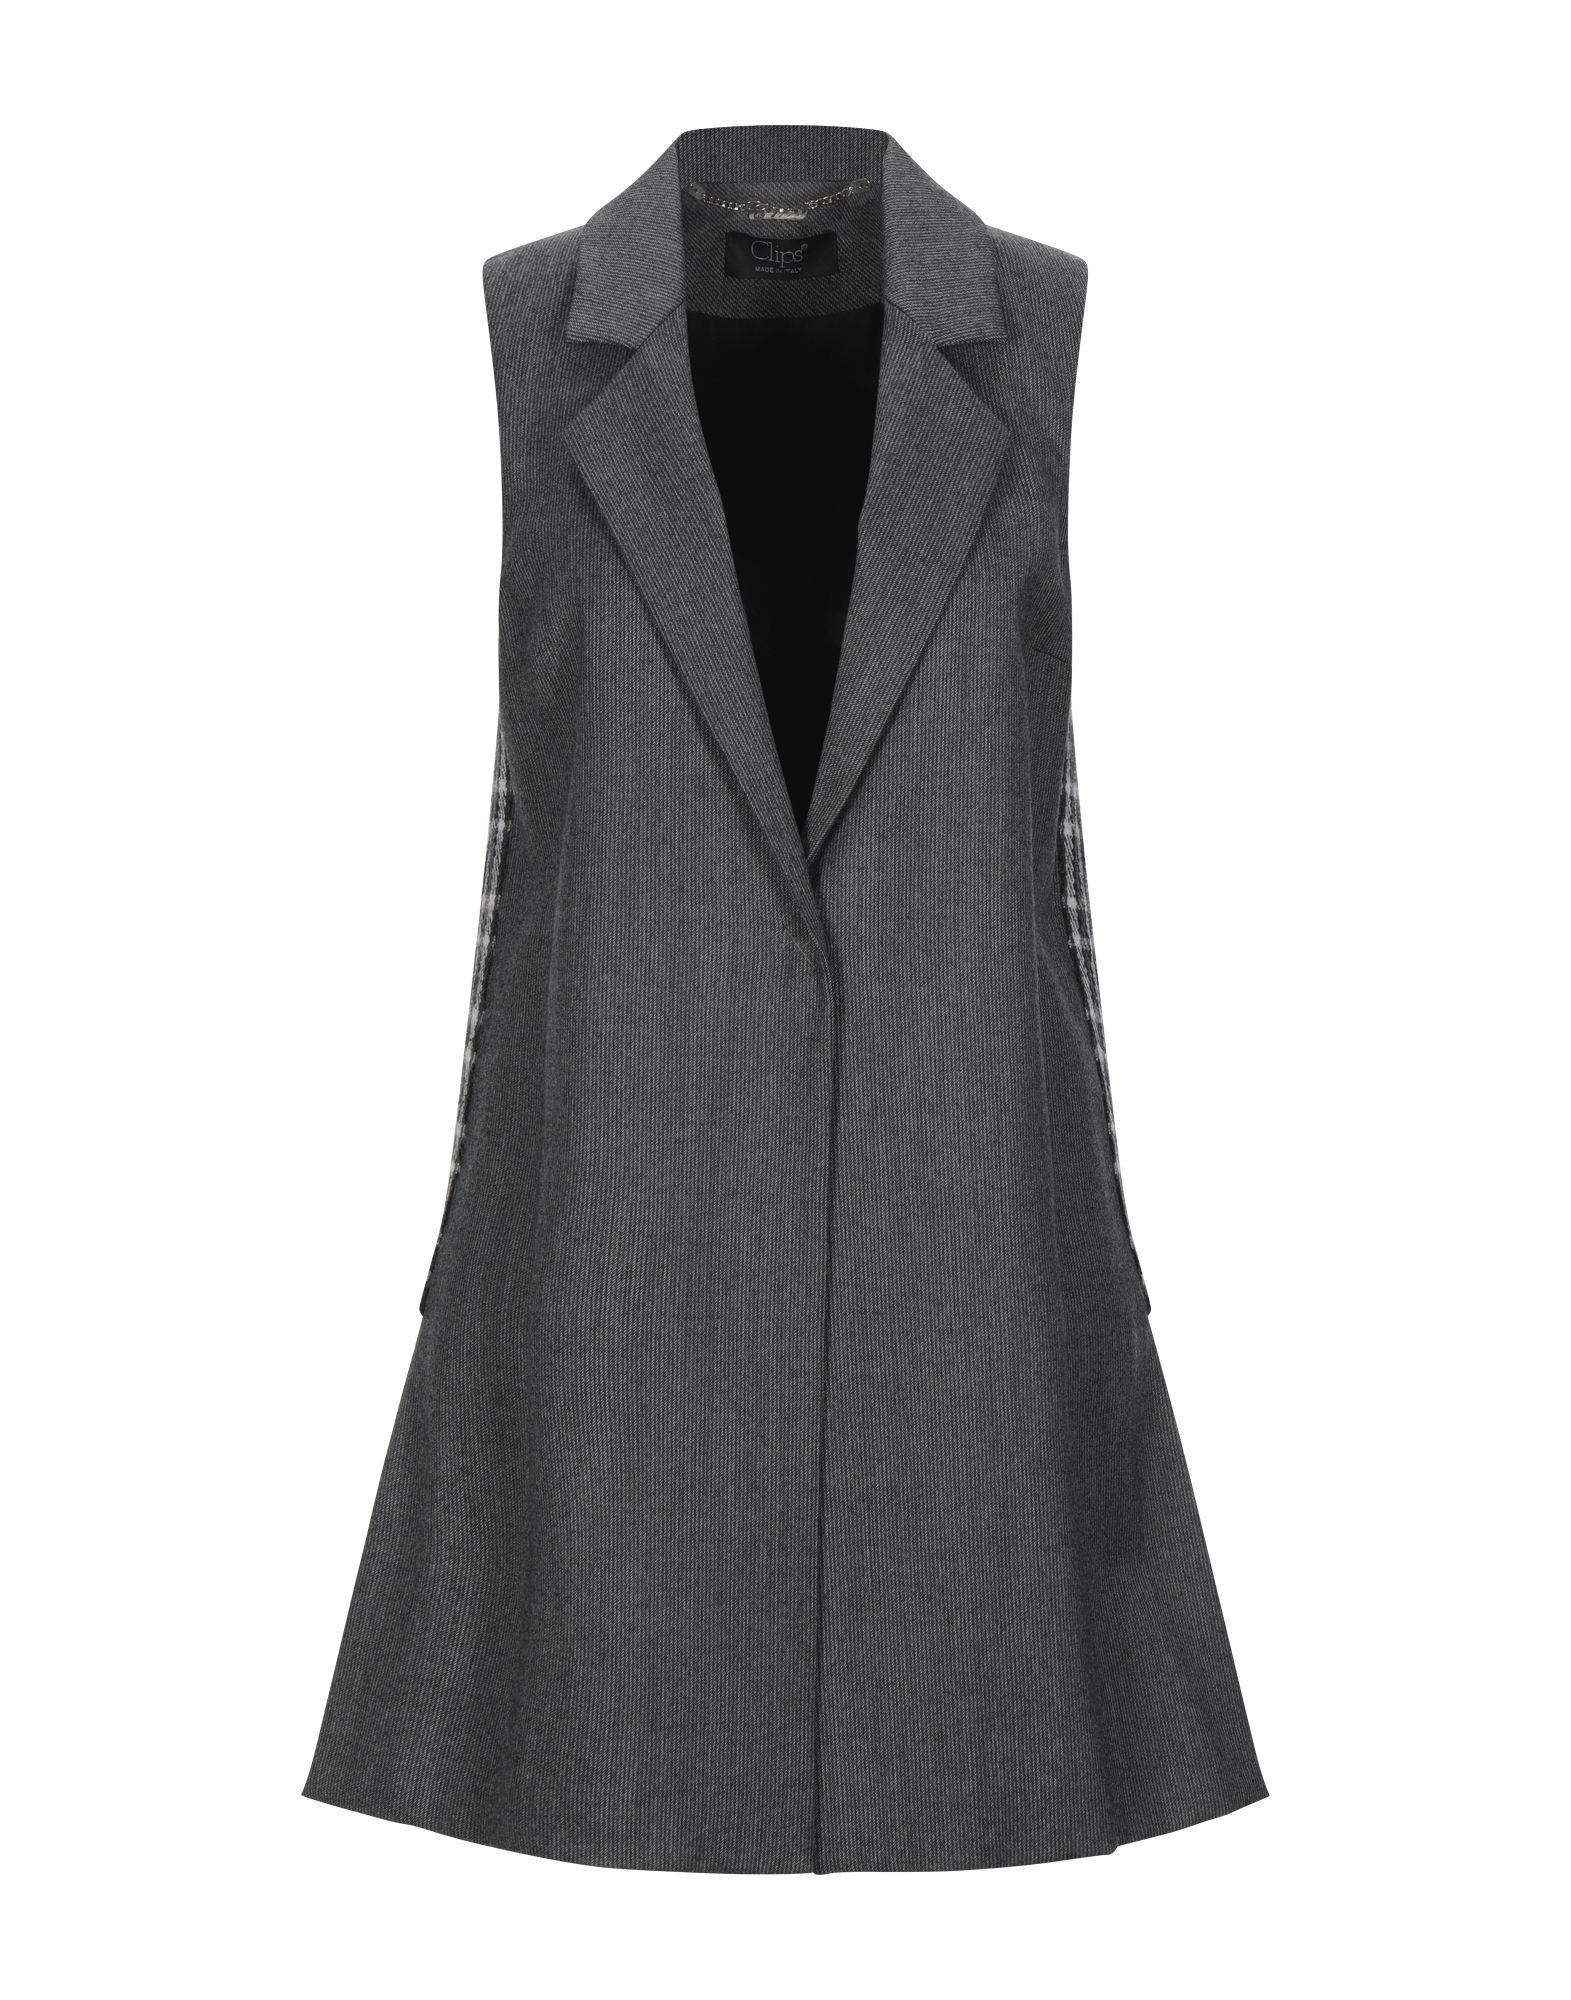 Фото - CLIPS Легкое пальто clips more легкое пальто